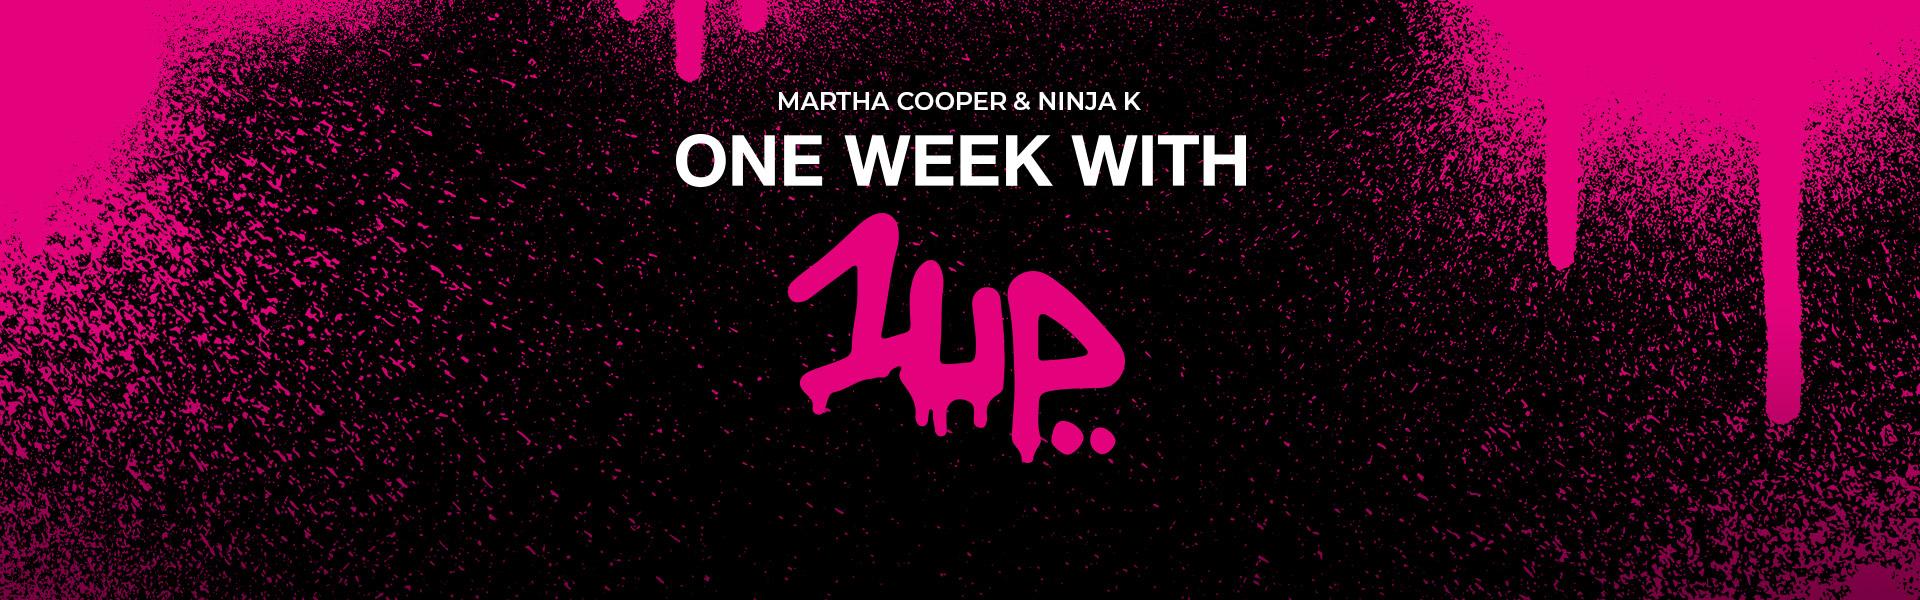 Martha Cooper: One Week With One UP